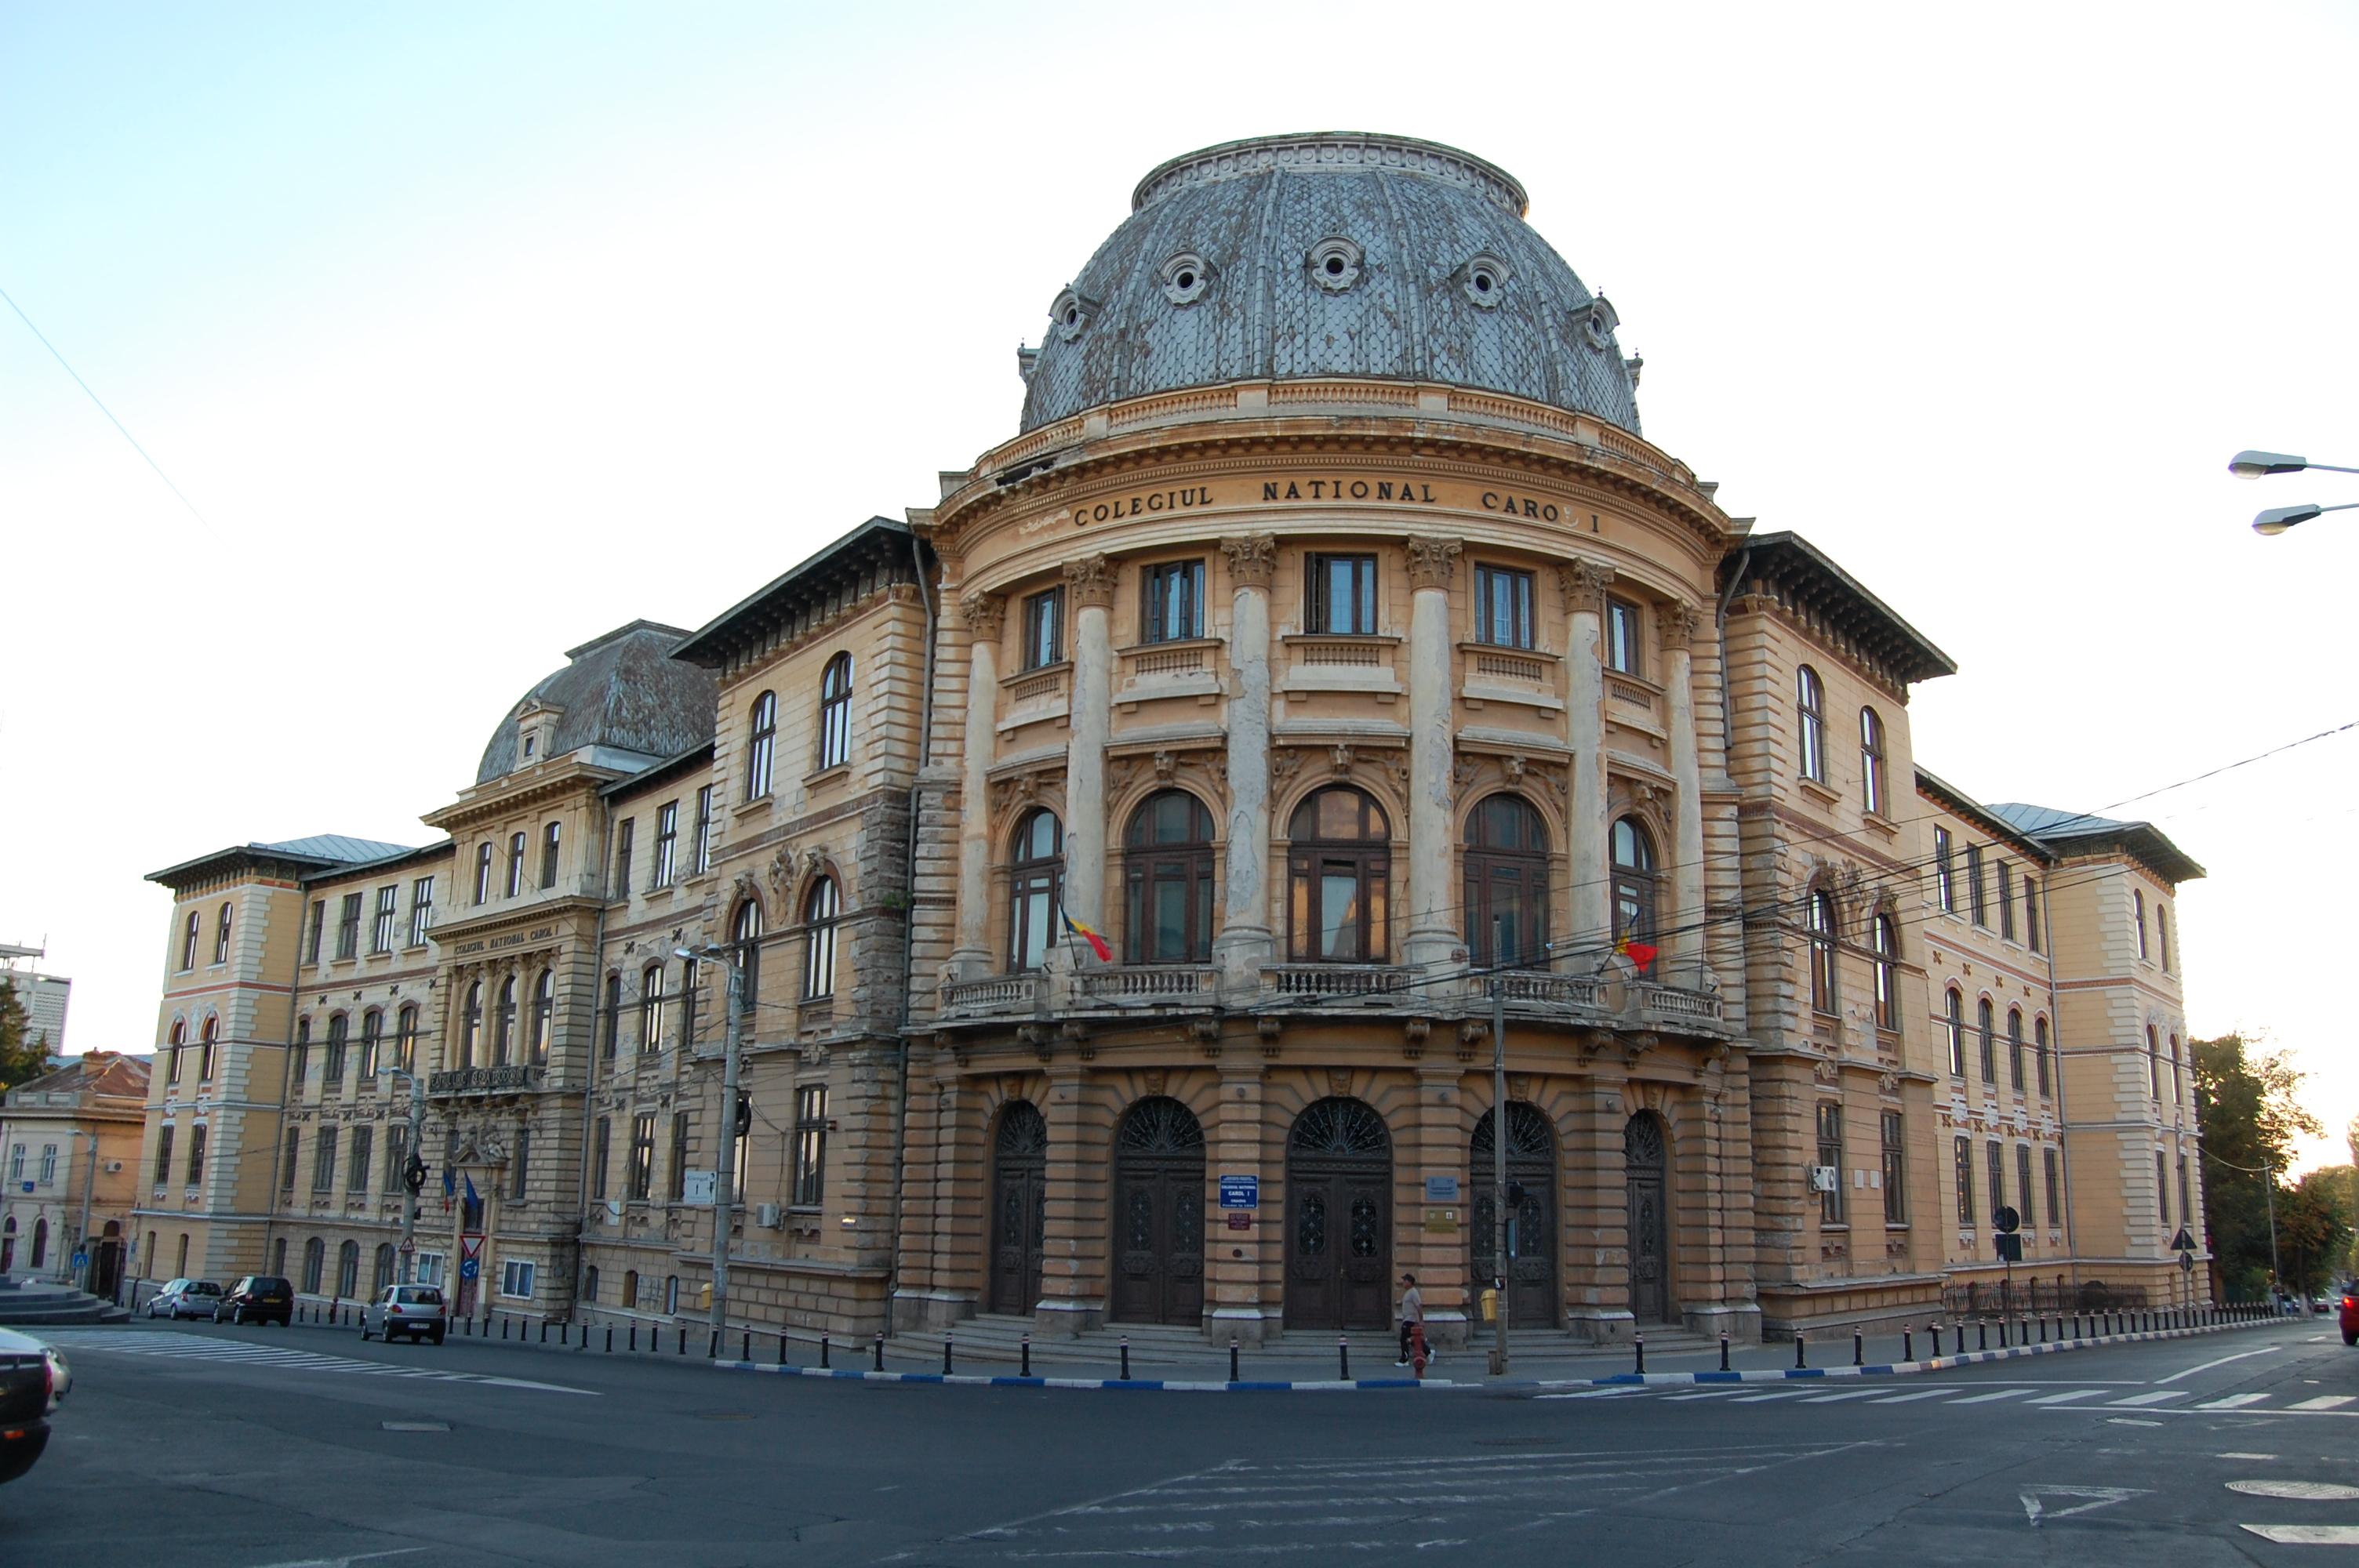 Incontri Craiova